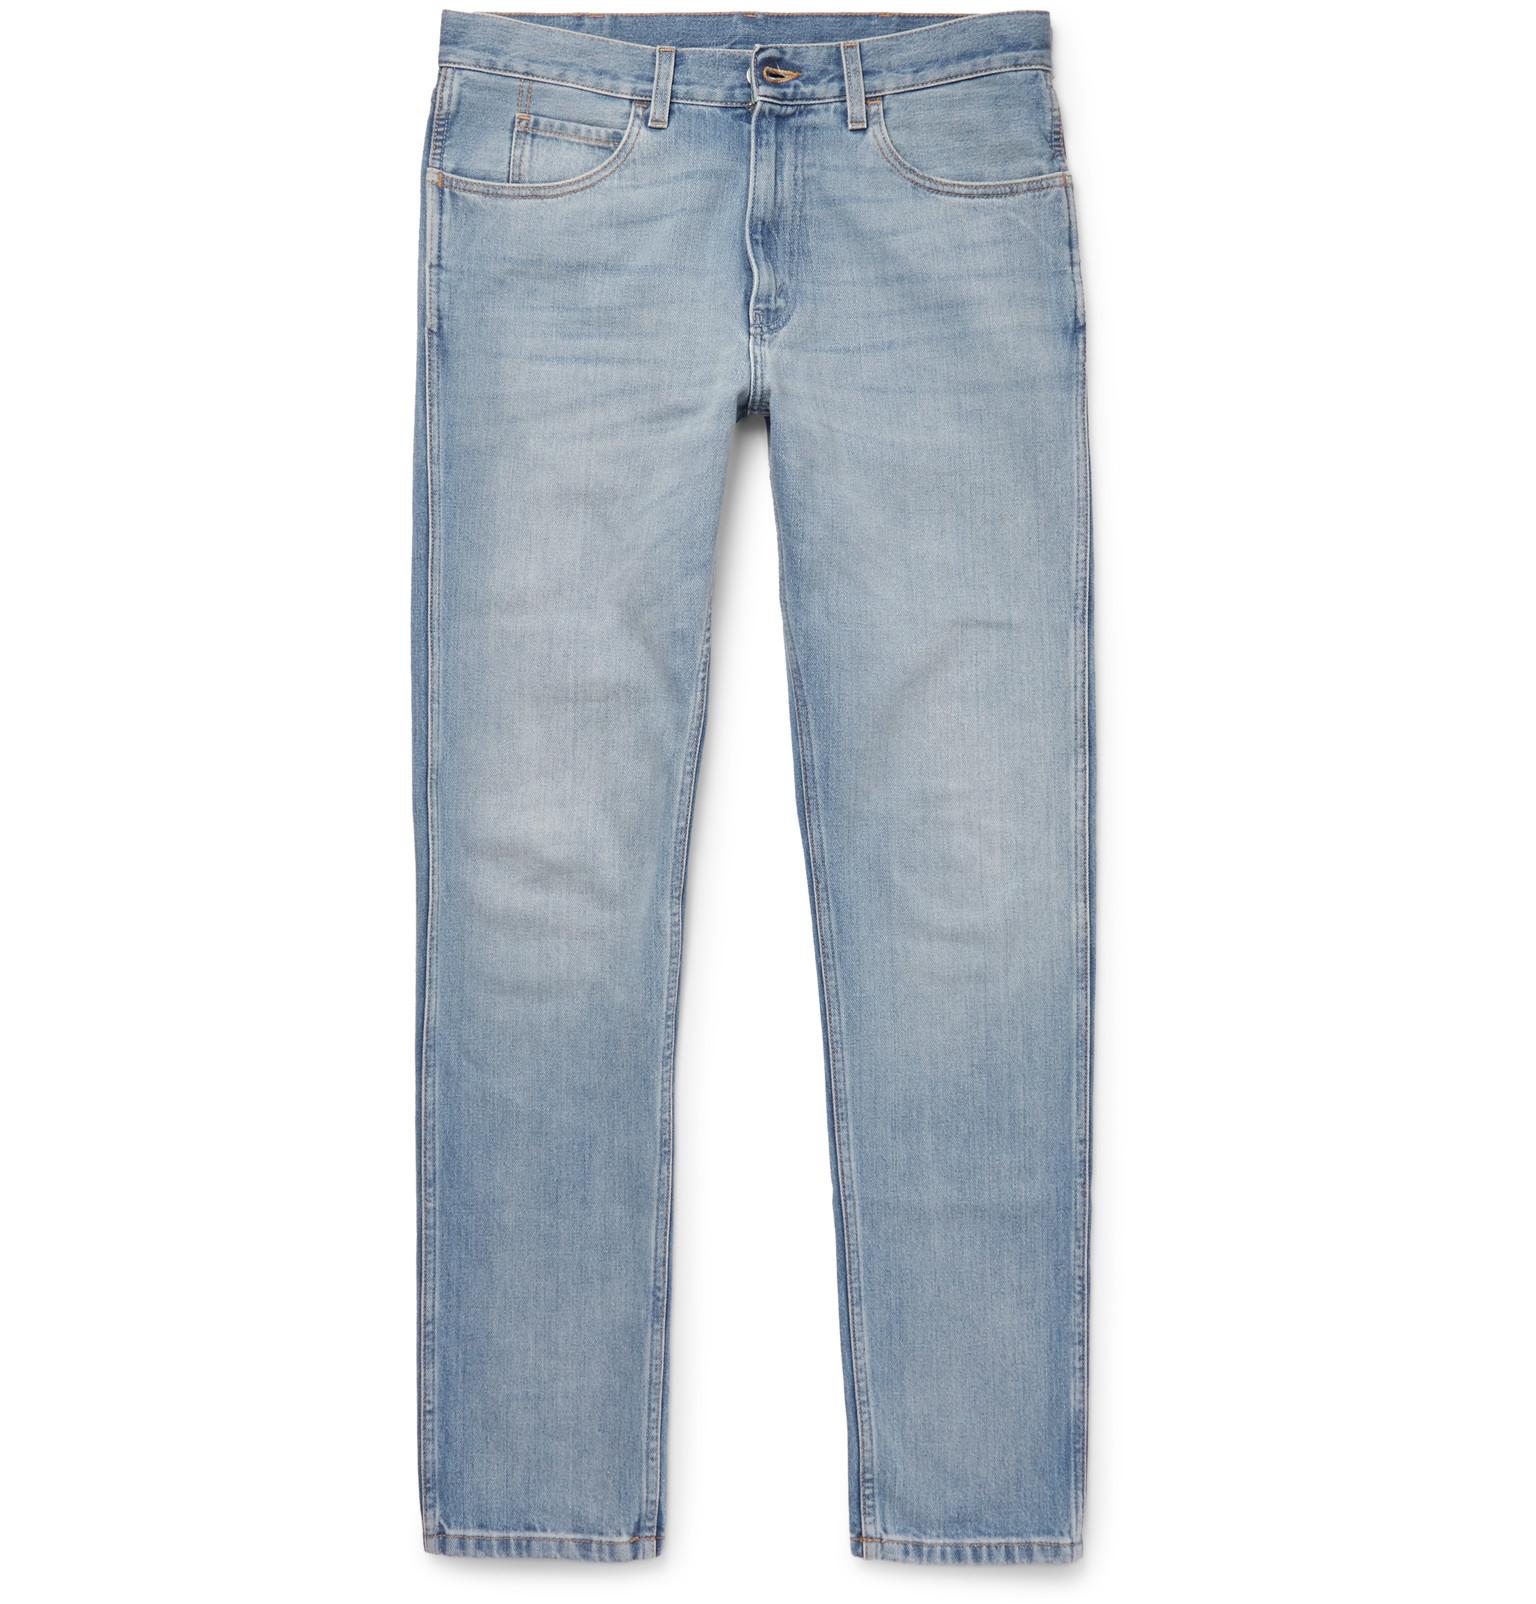 Gucci Slim-fit Denim Jeans in Blue for Men